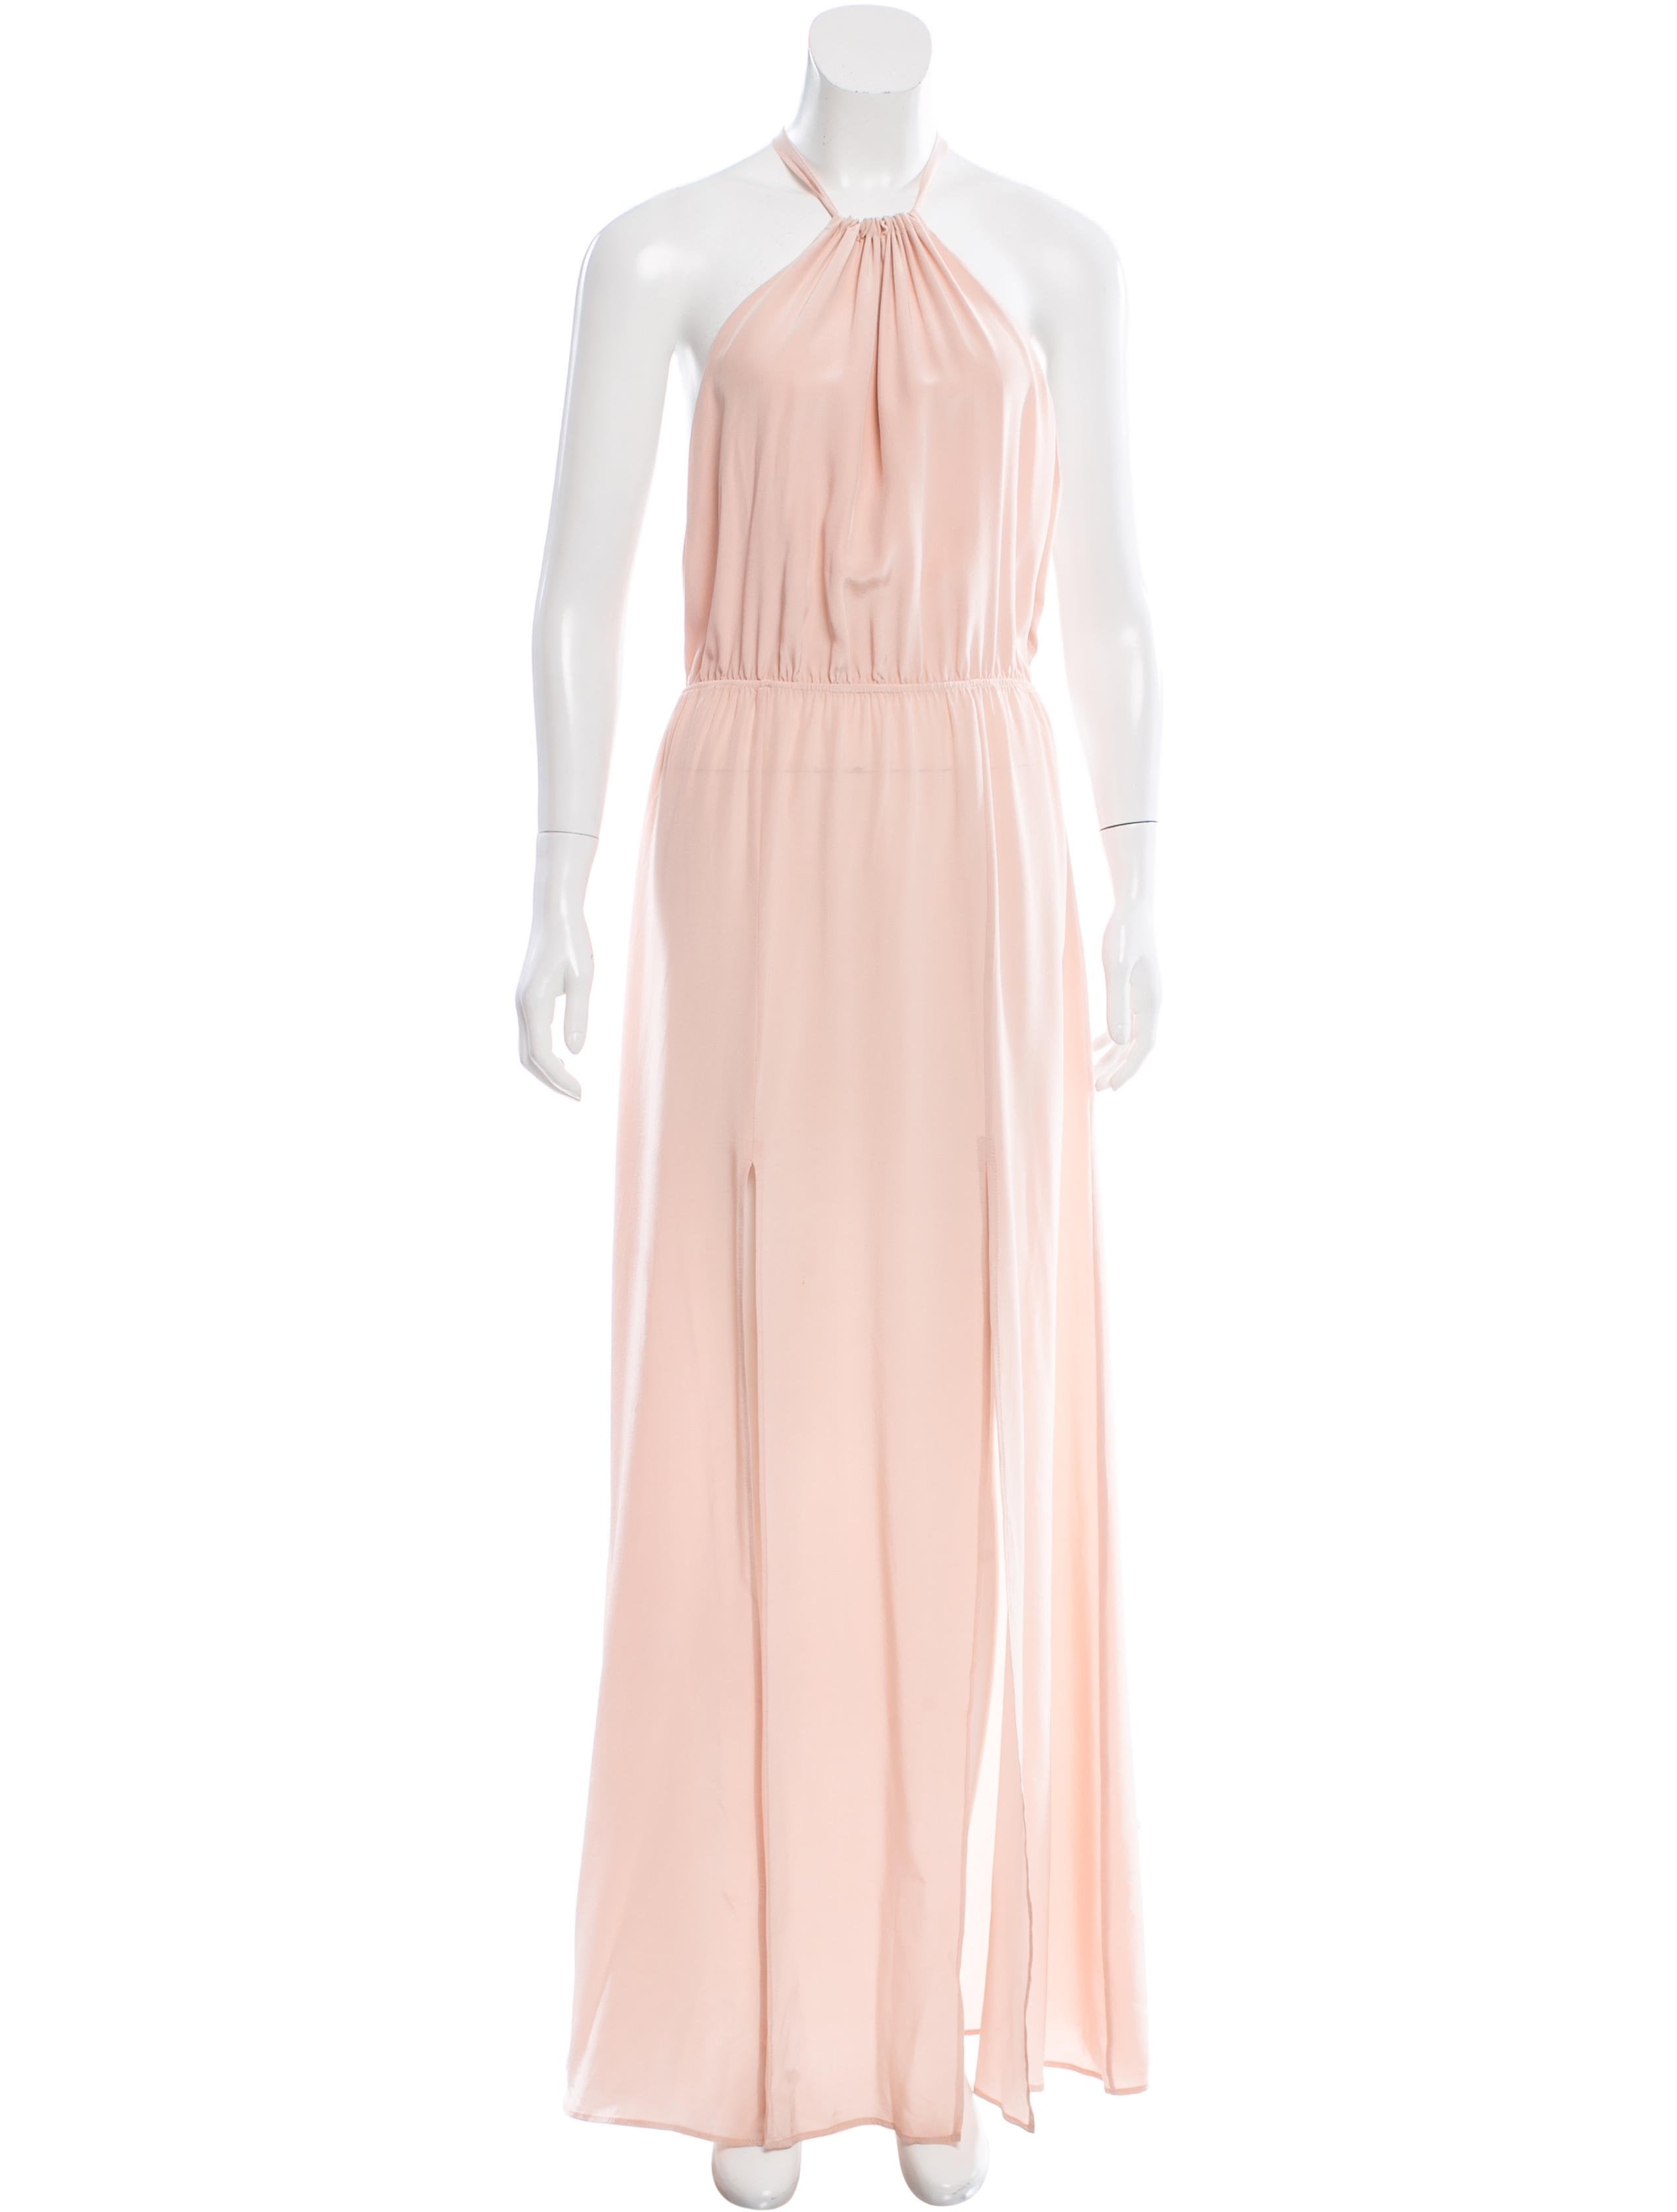 Stone Cold Fox Silk Halter Dress w/ Tags - Clothing - WSFOX20065 ...